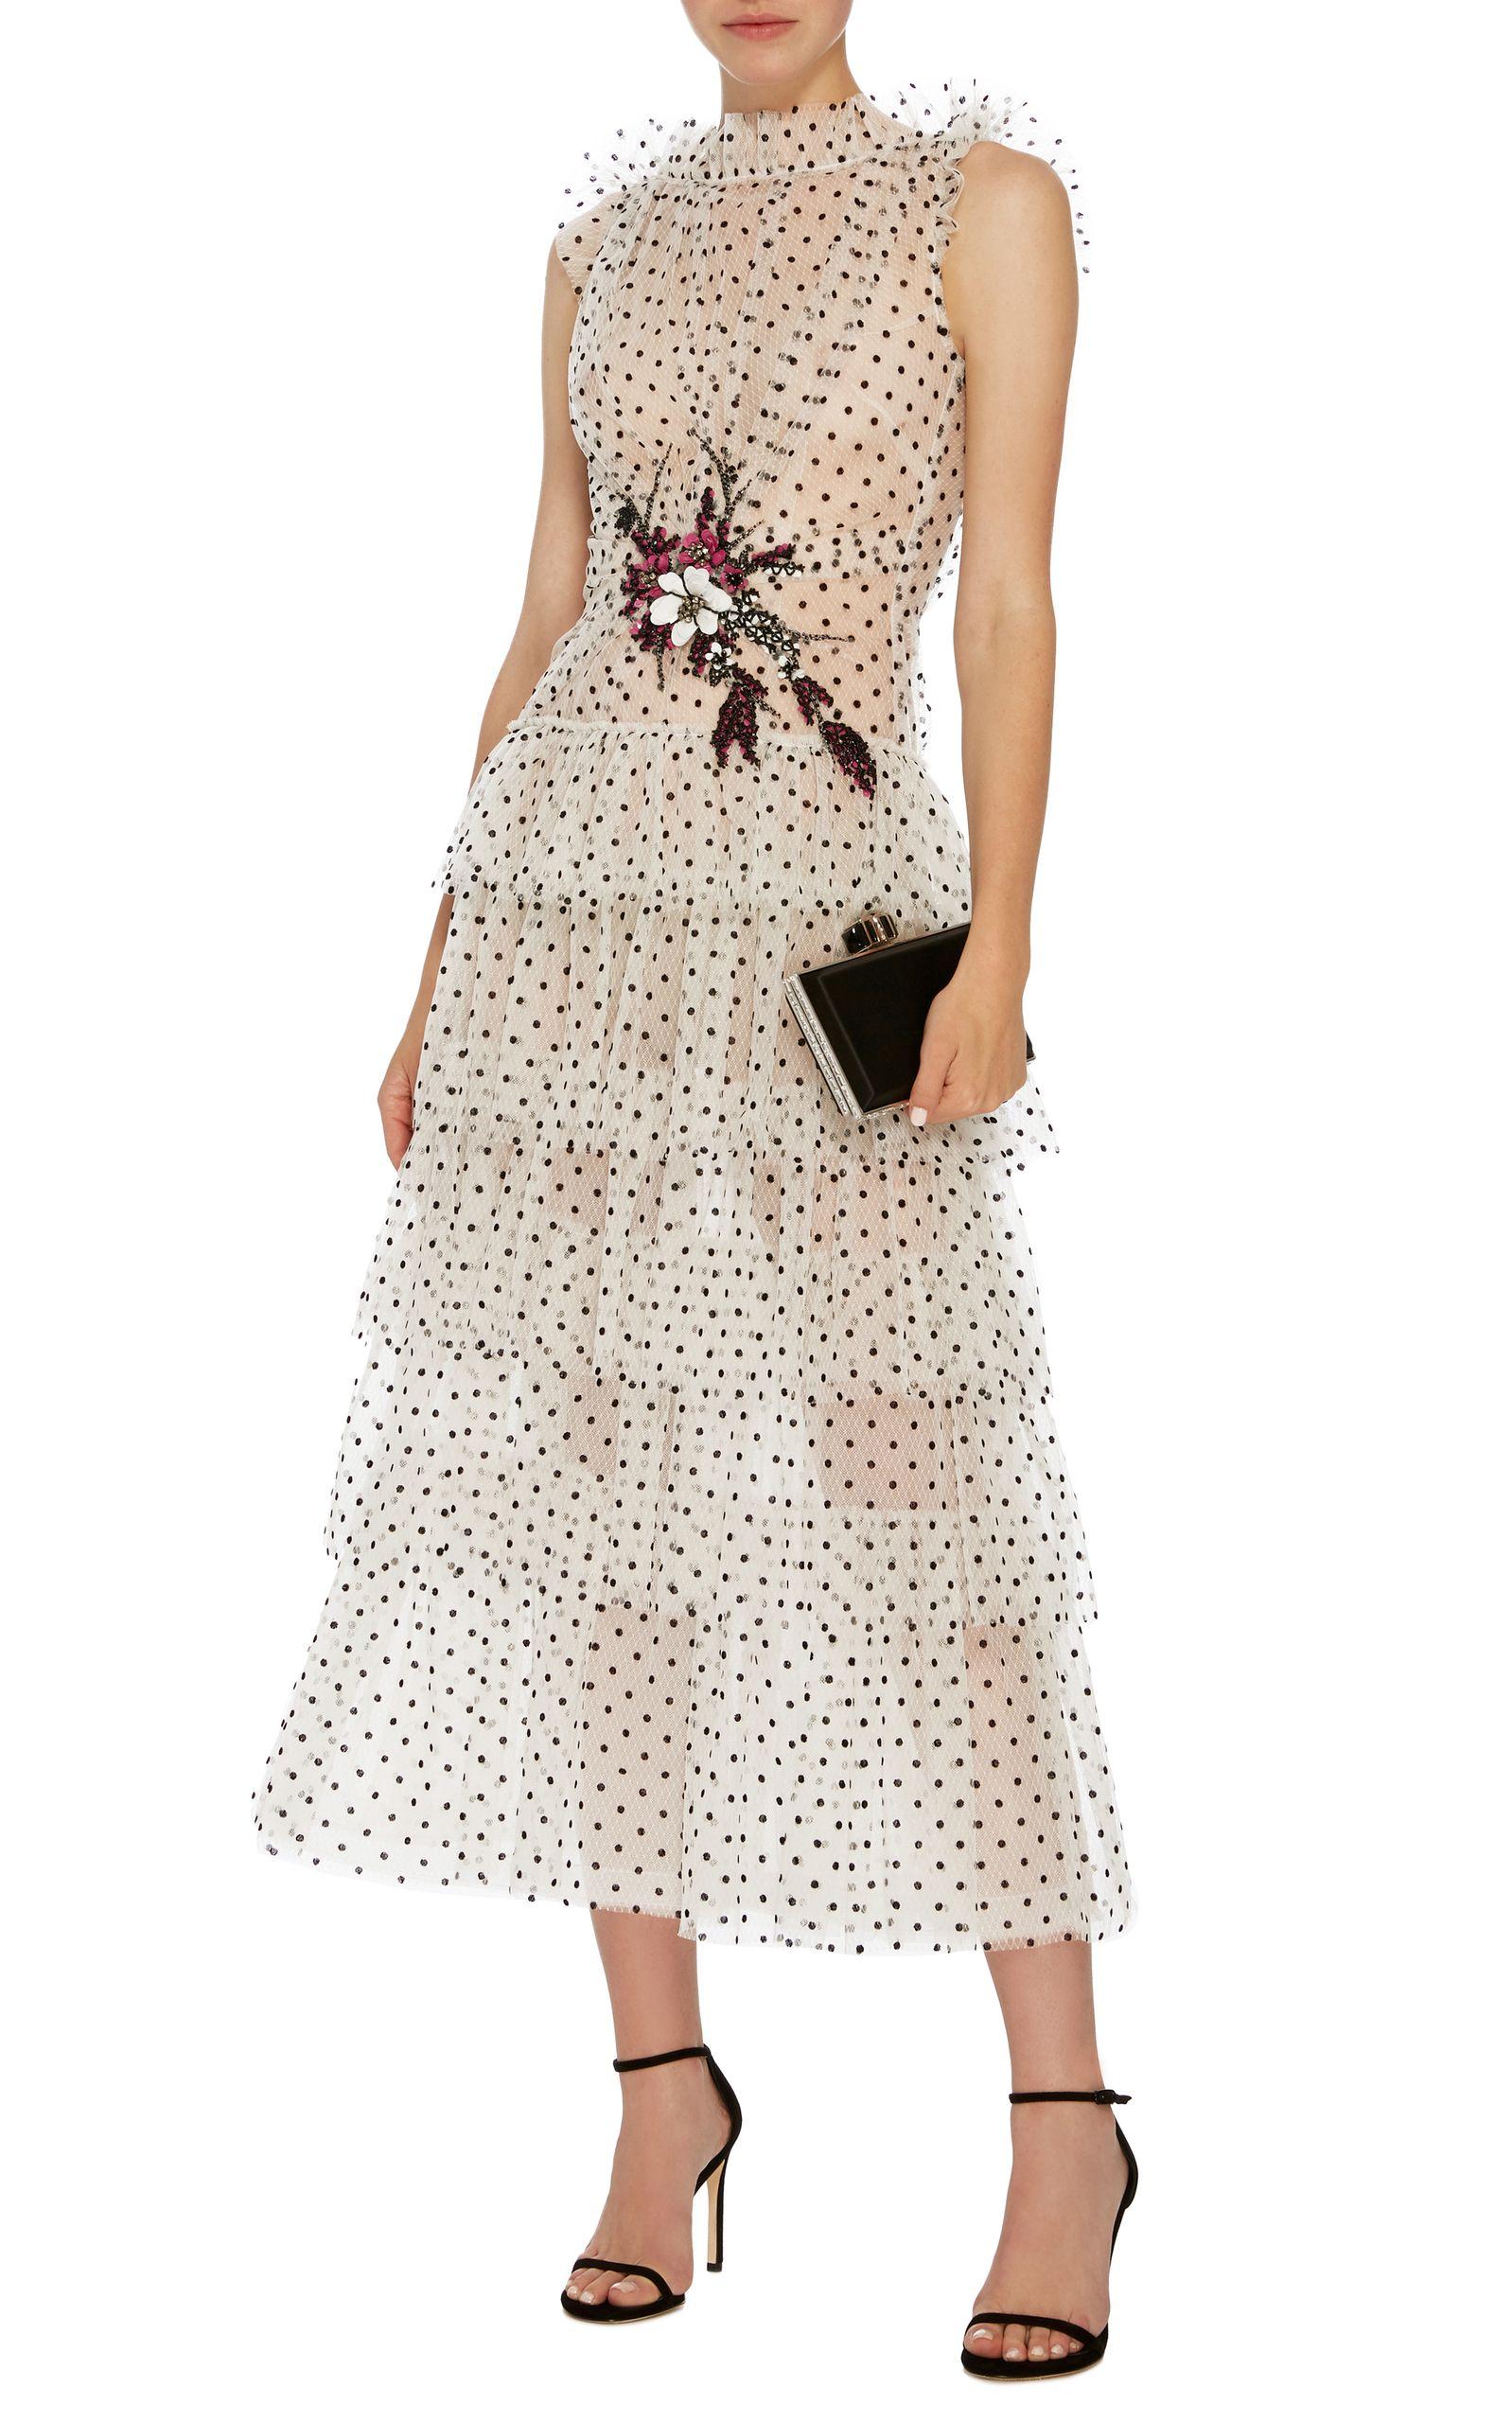 Flocked Tulle Ruffle Dress By Rodarte Now Available On Moda Operandi Dresses Fashion Tulle Ruffle Dress [ 2560 x 1598 Pixel ]